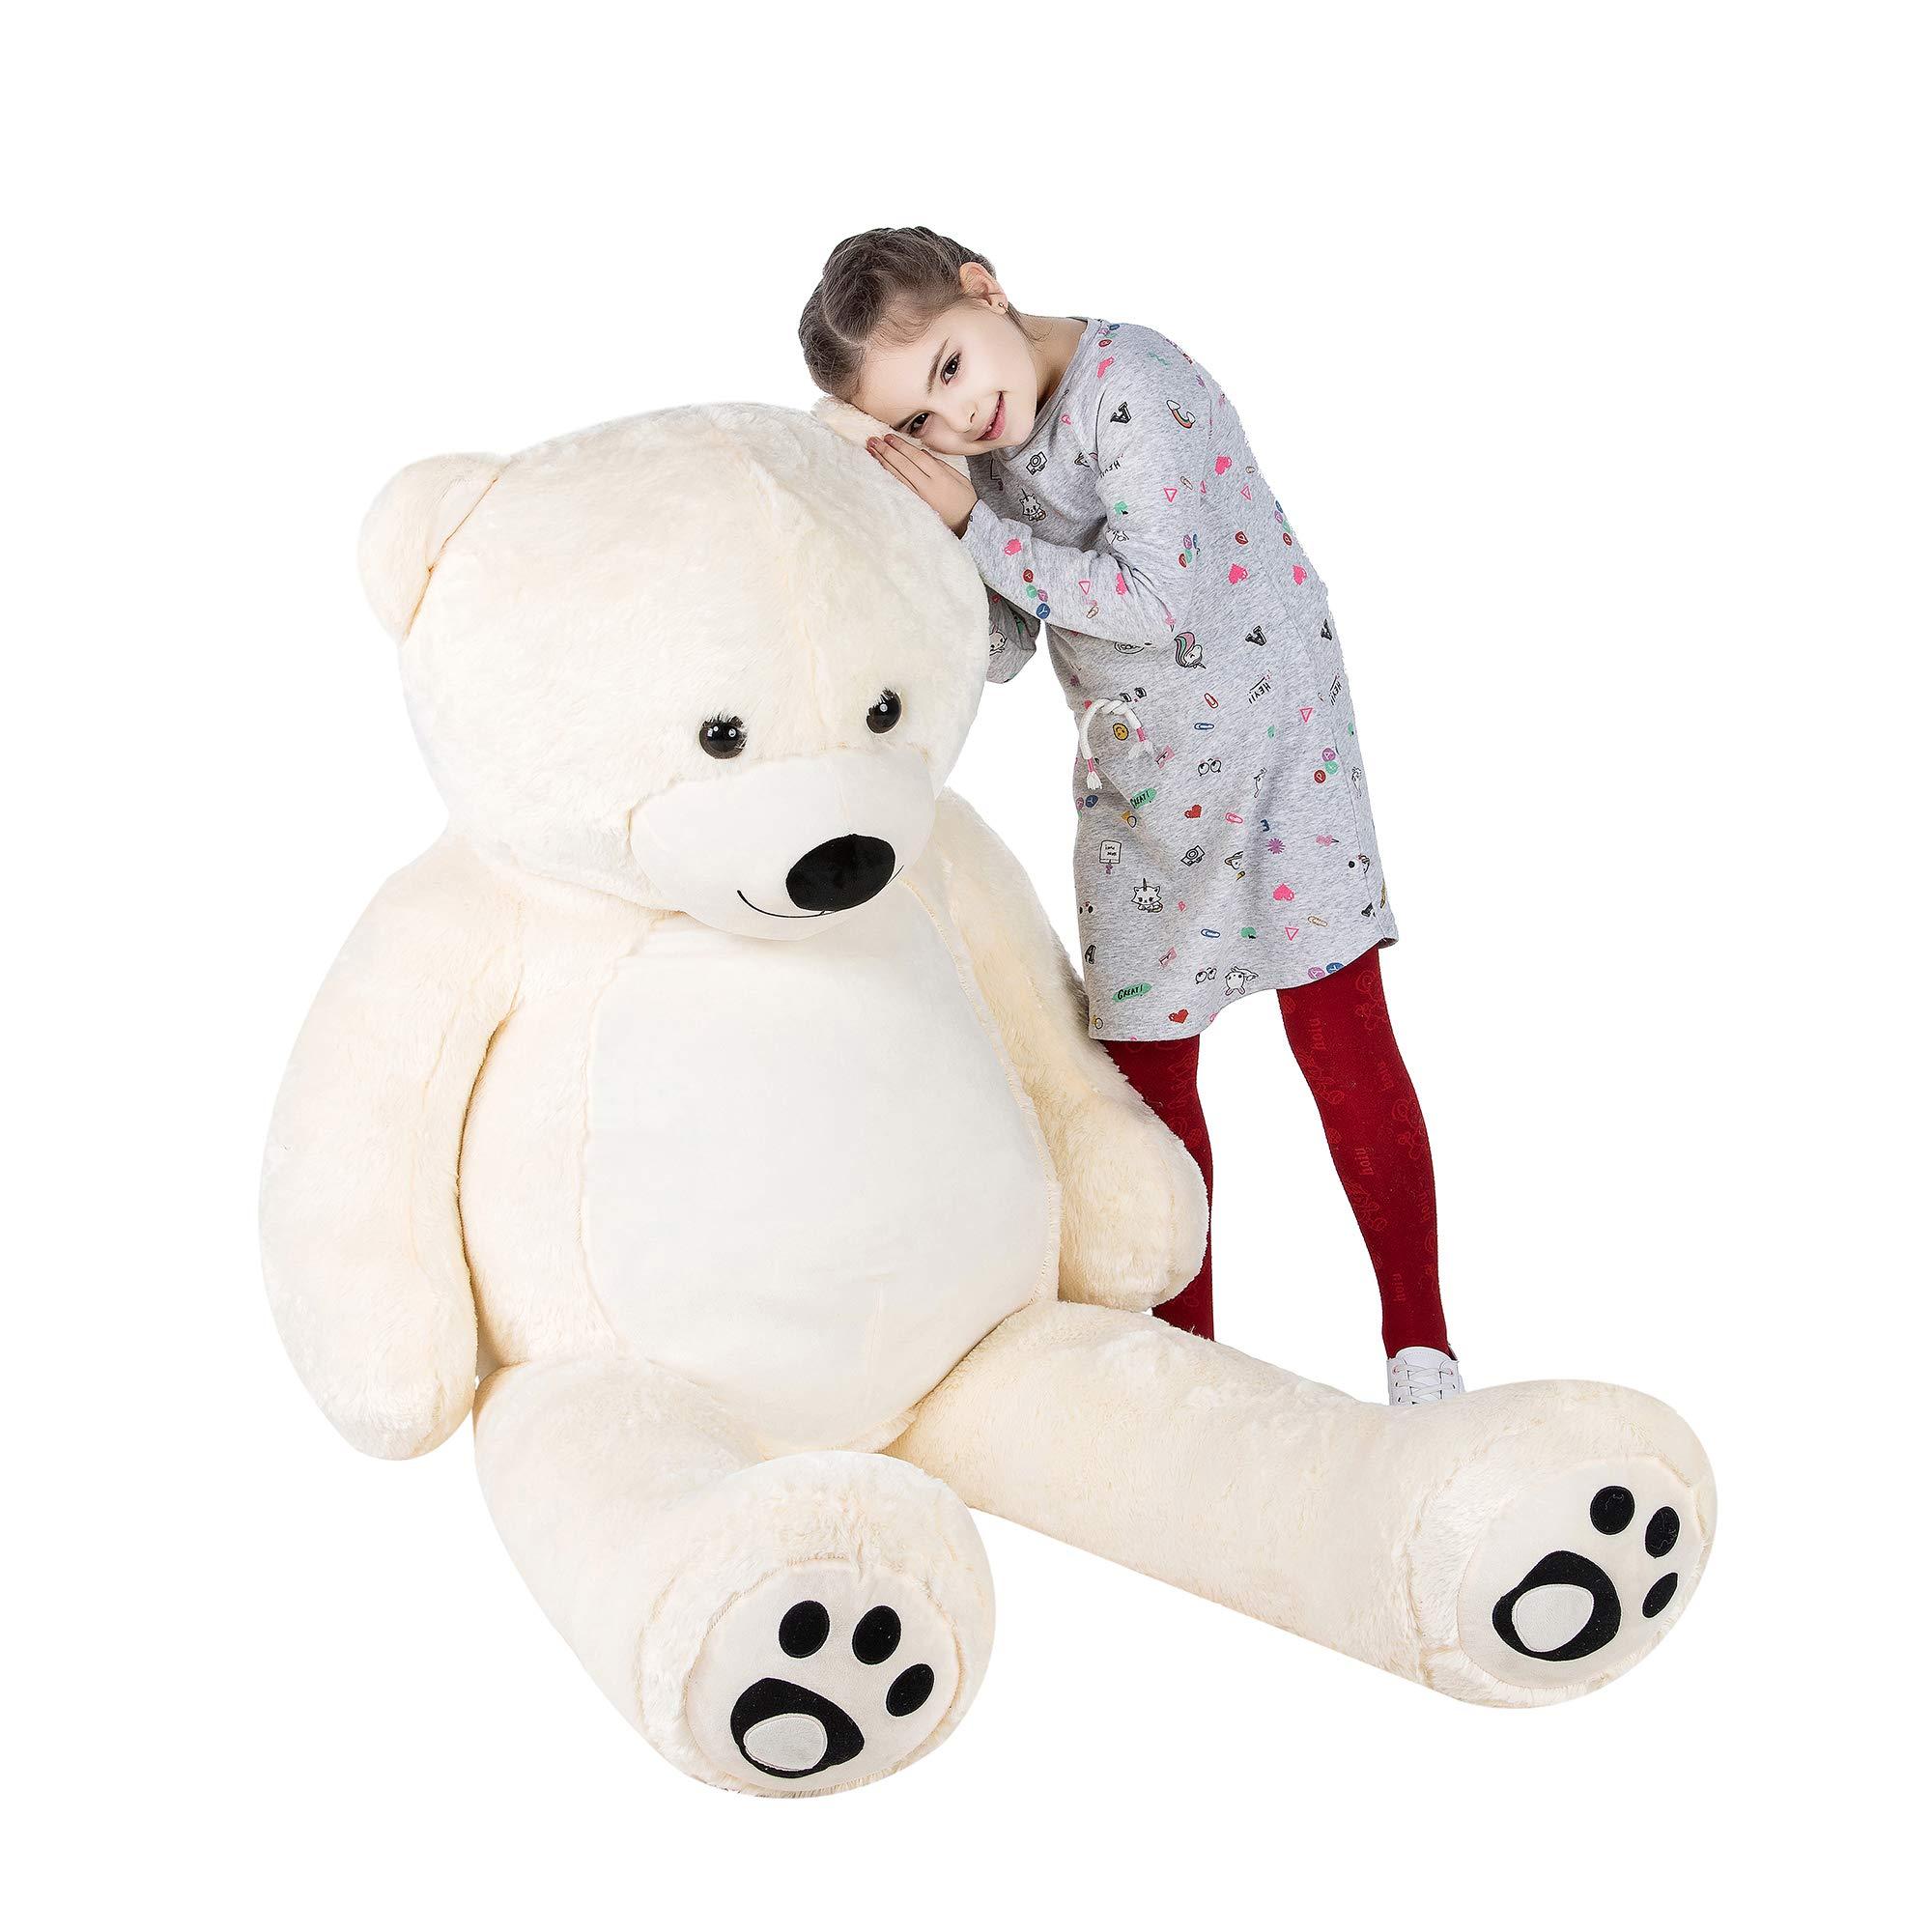 VERCART Giant Huge Cuddly Stuffed Animals Plush Teddy Bear Toy Doll for Birthday Children's Day Valentine's Day (72 inch, White) by VERCART